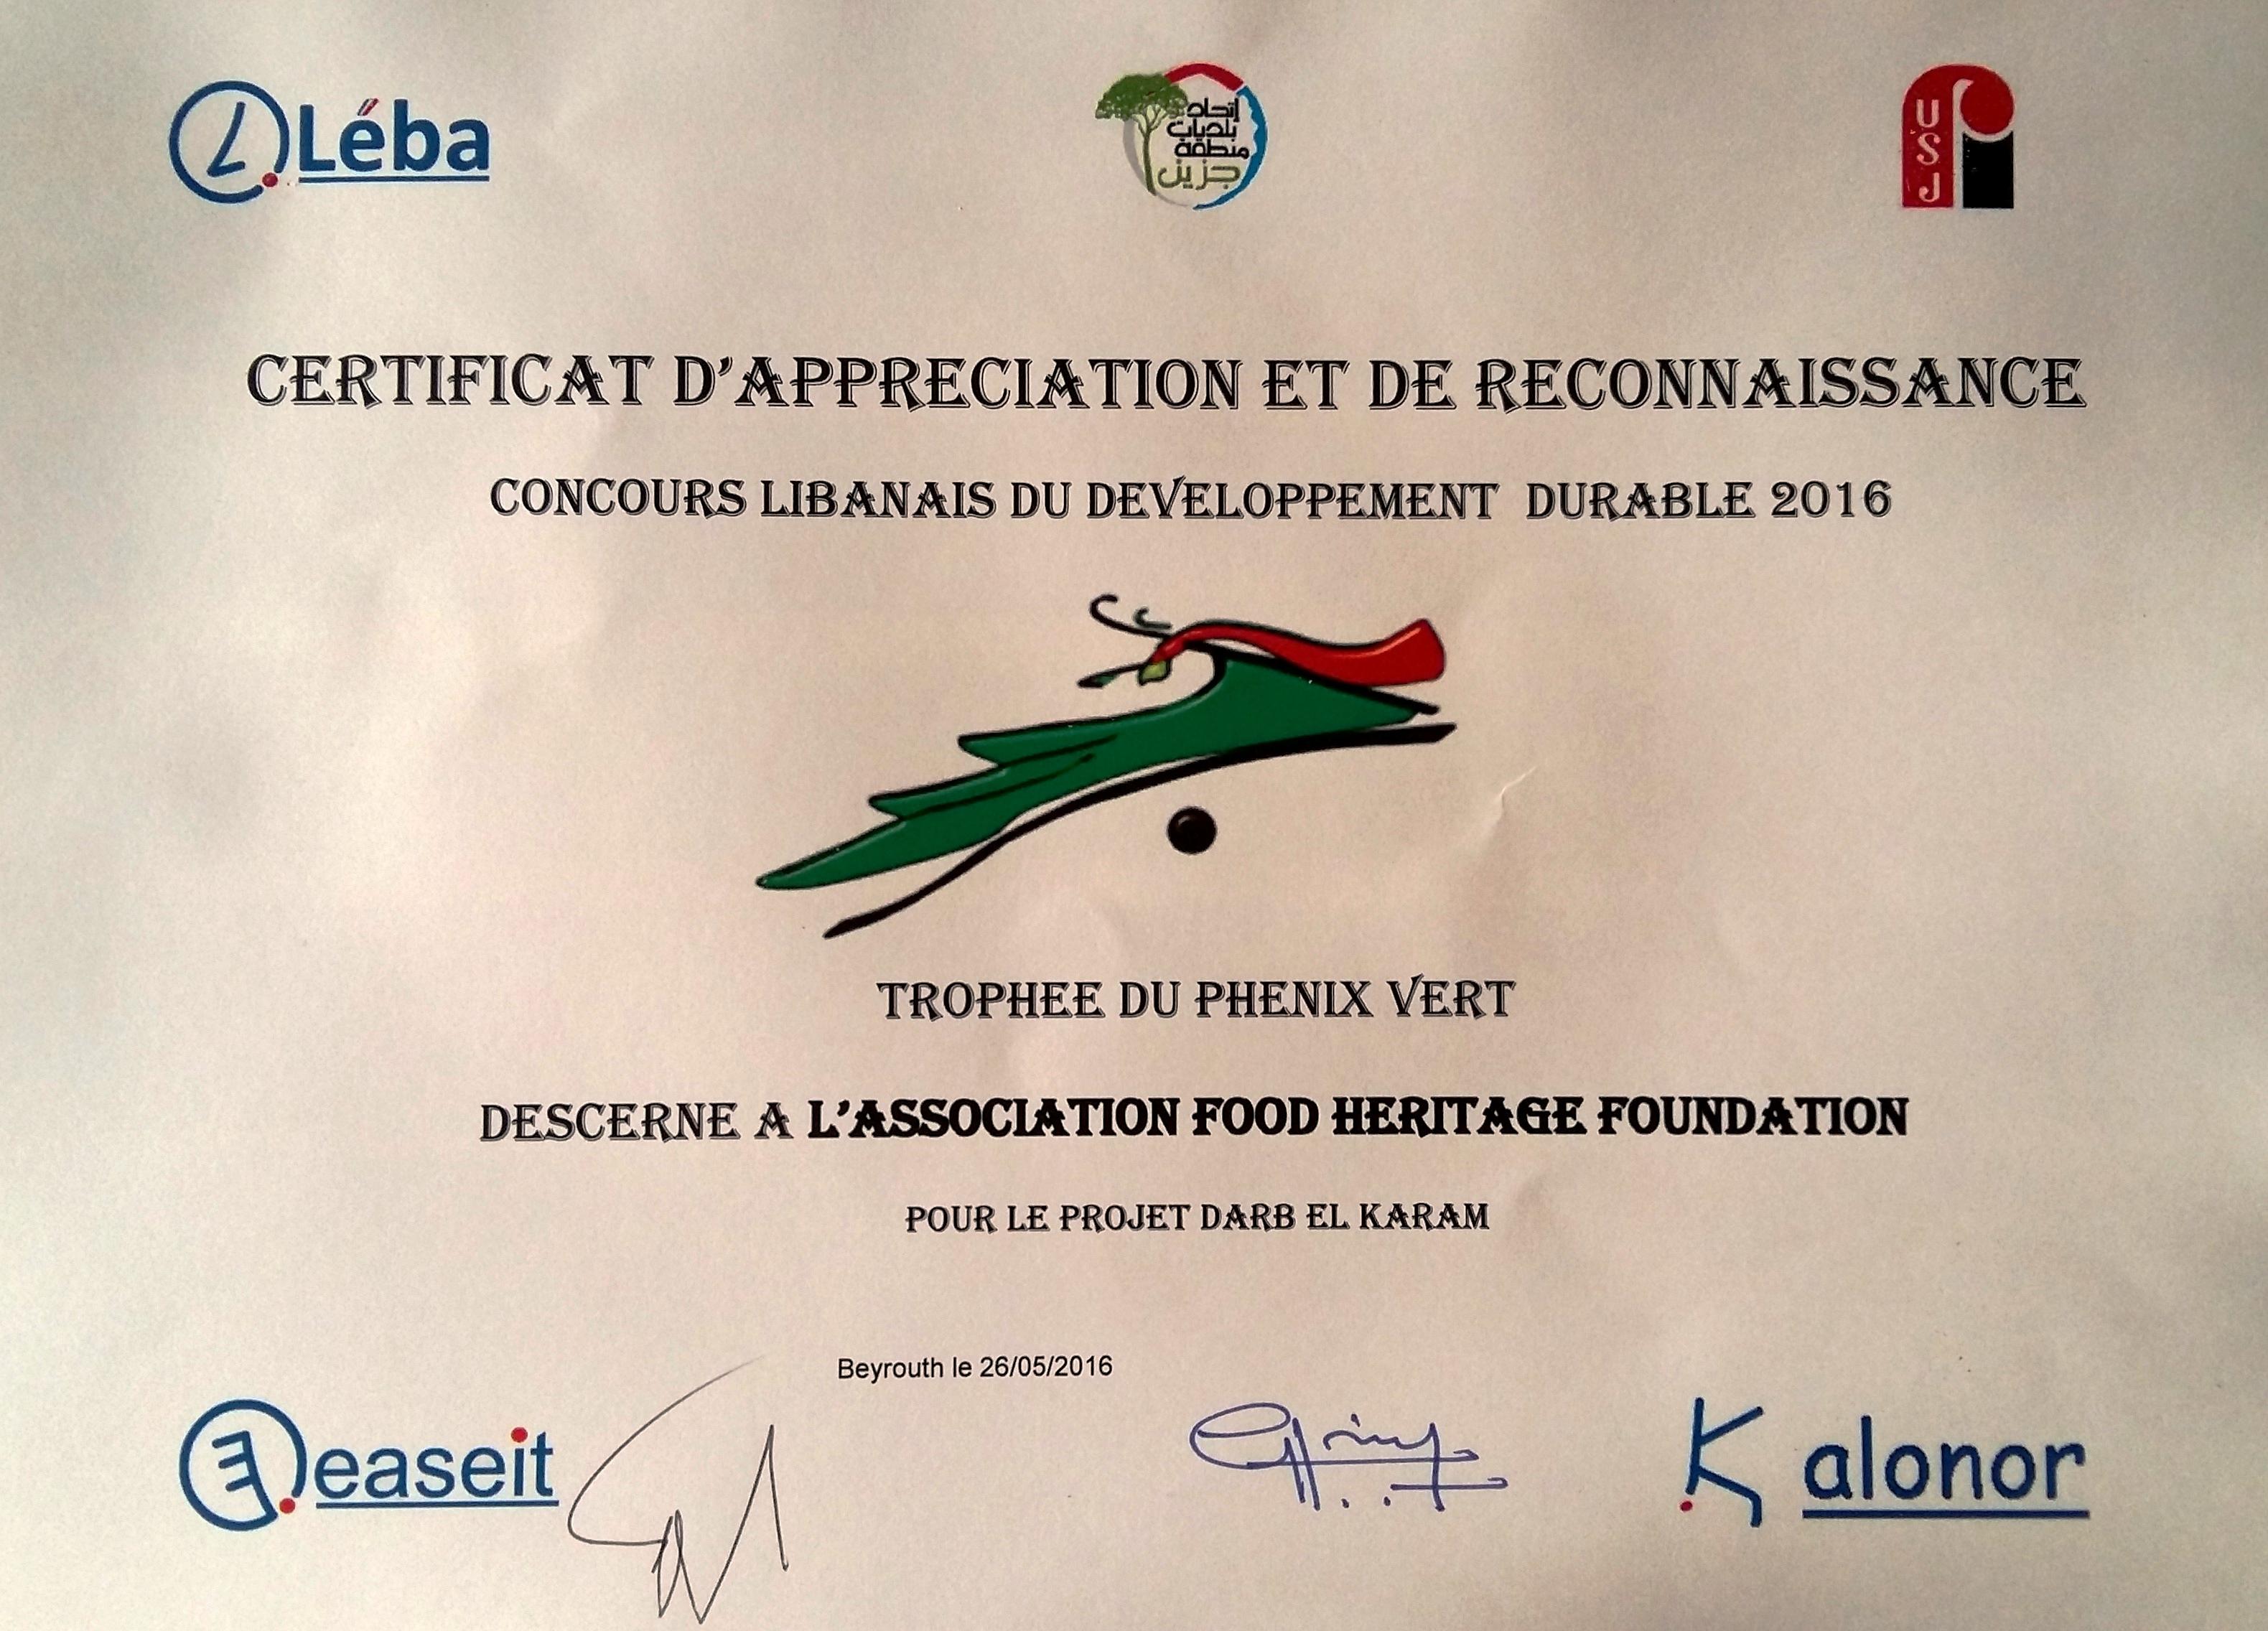 The Green Phoenix certificate 2016